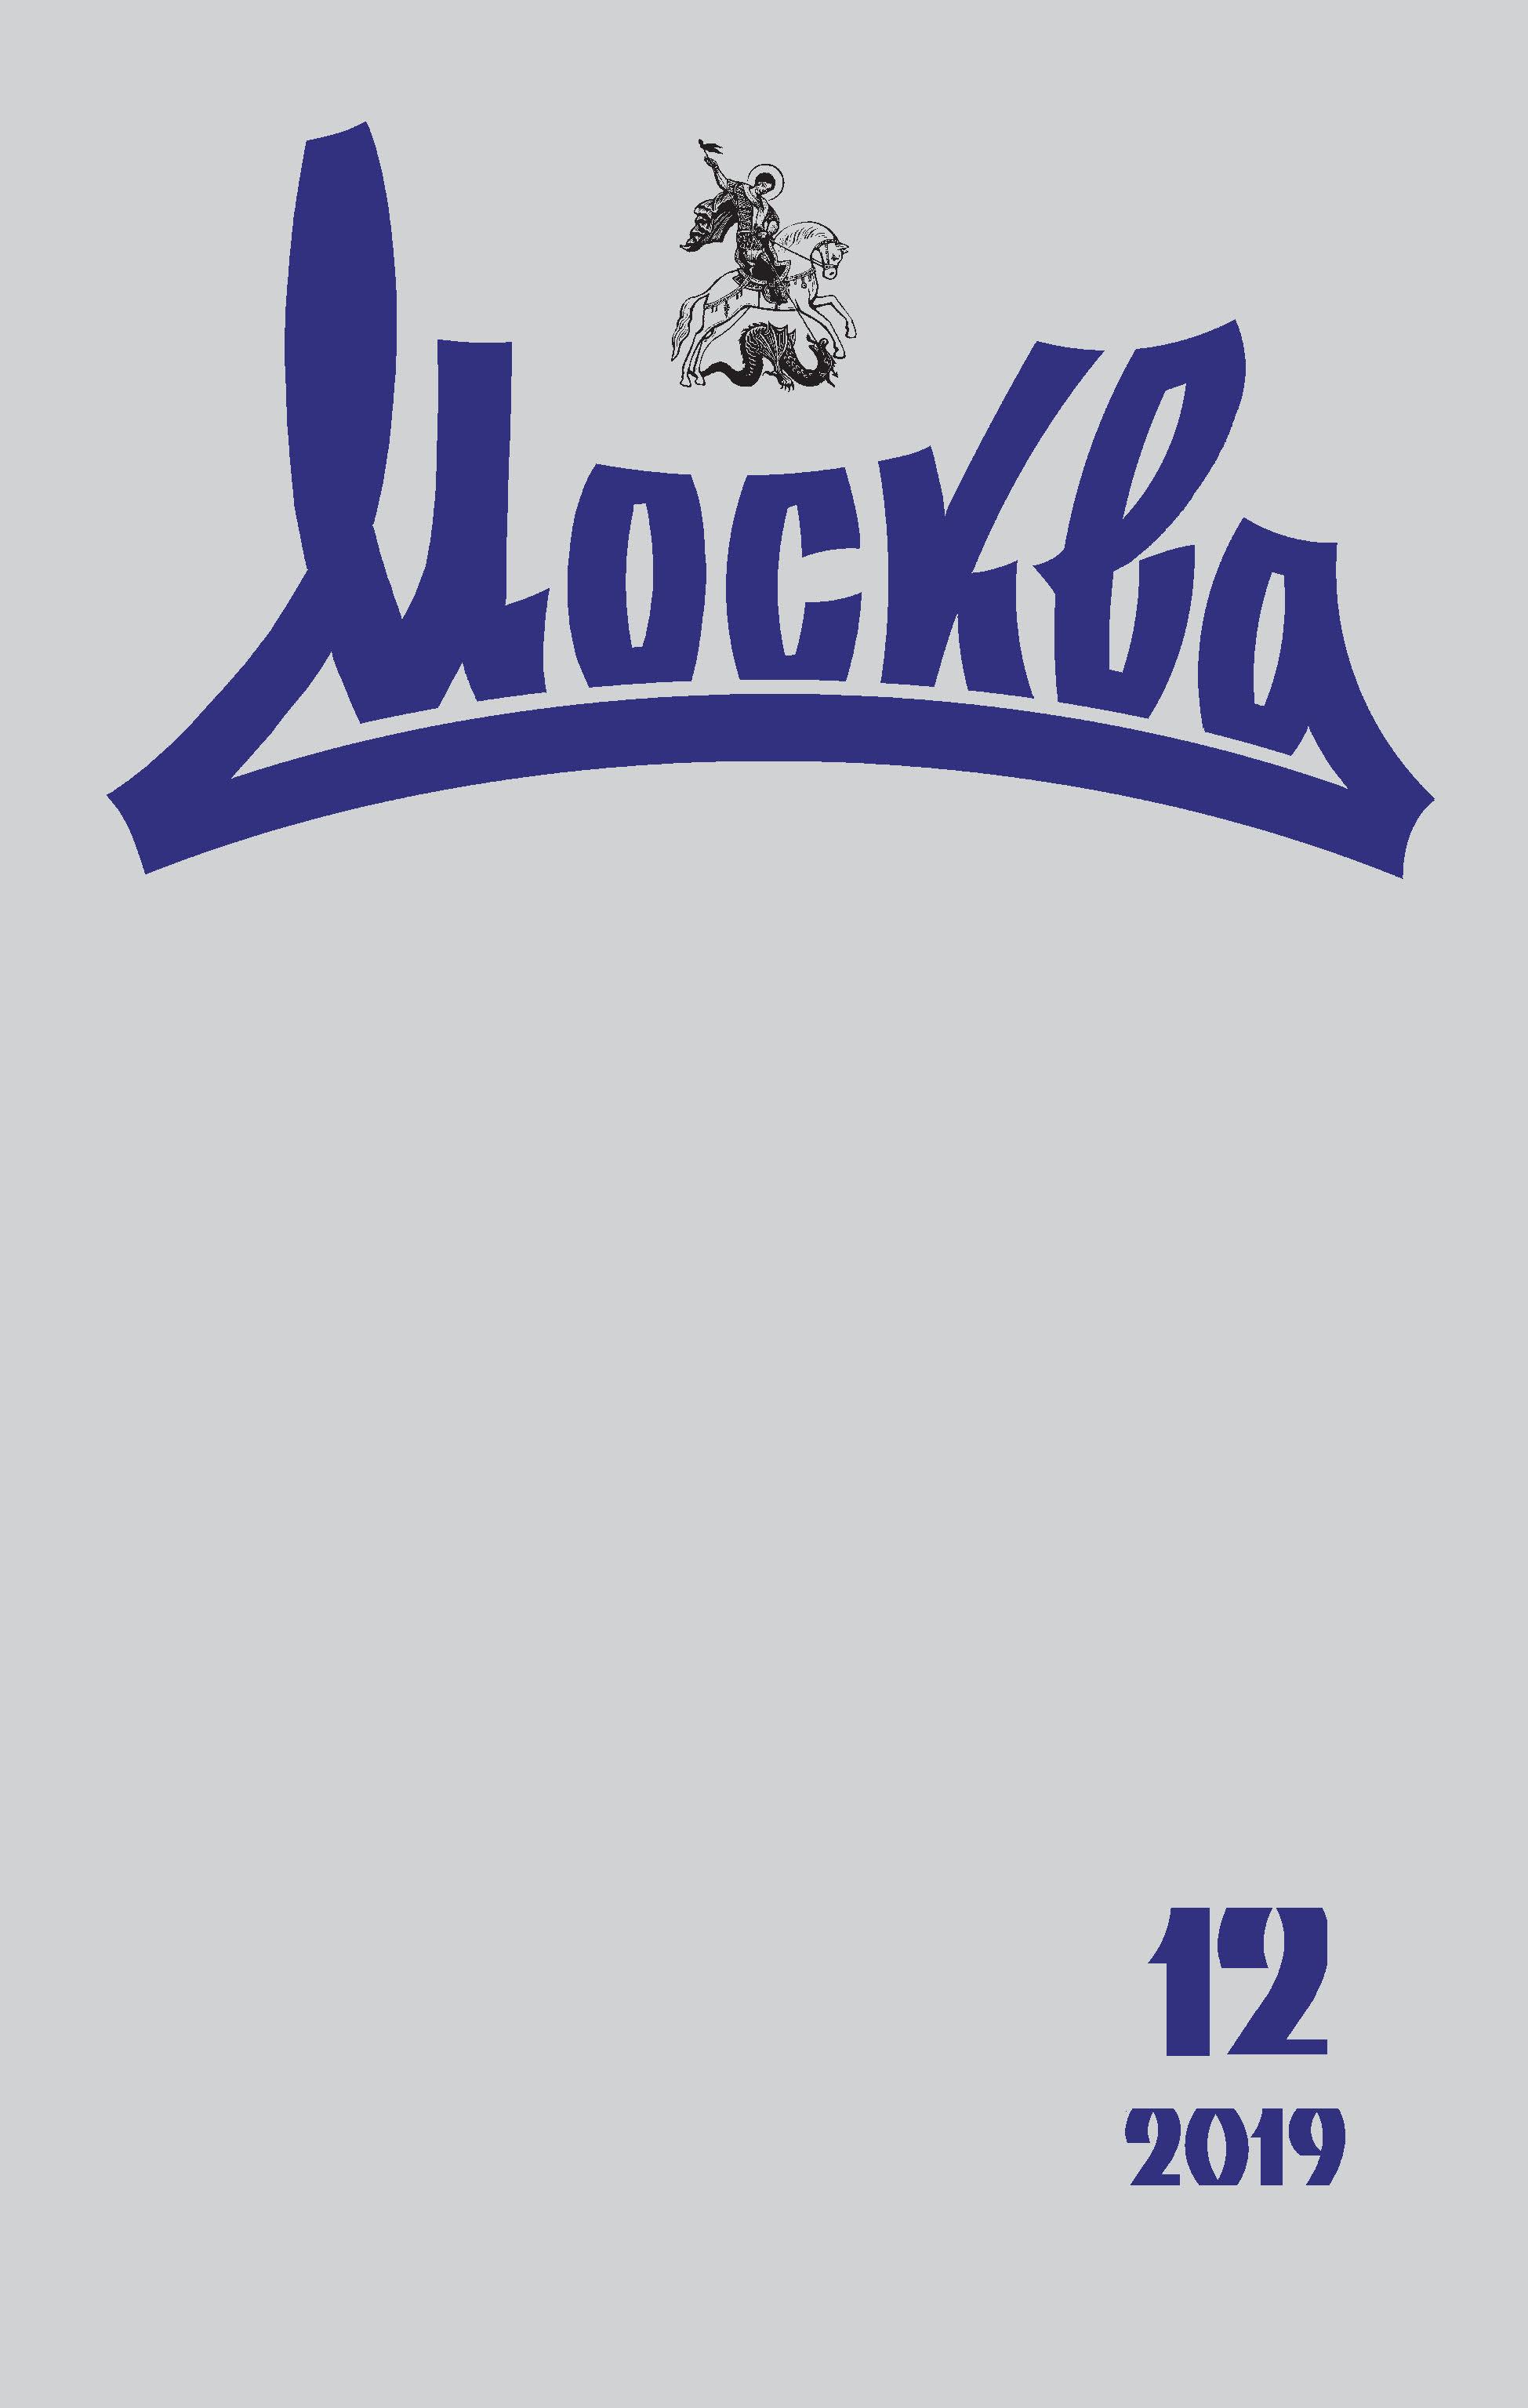 Журнал русской культуры «Москва» №12/2019